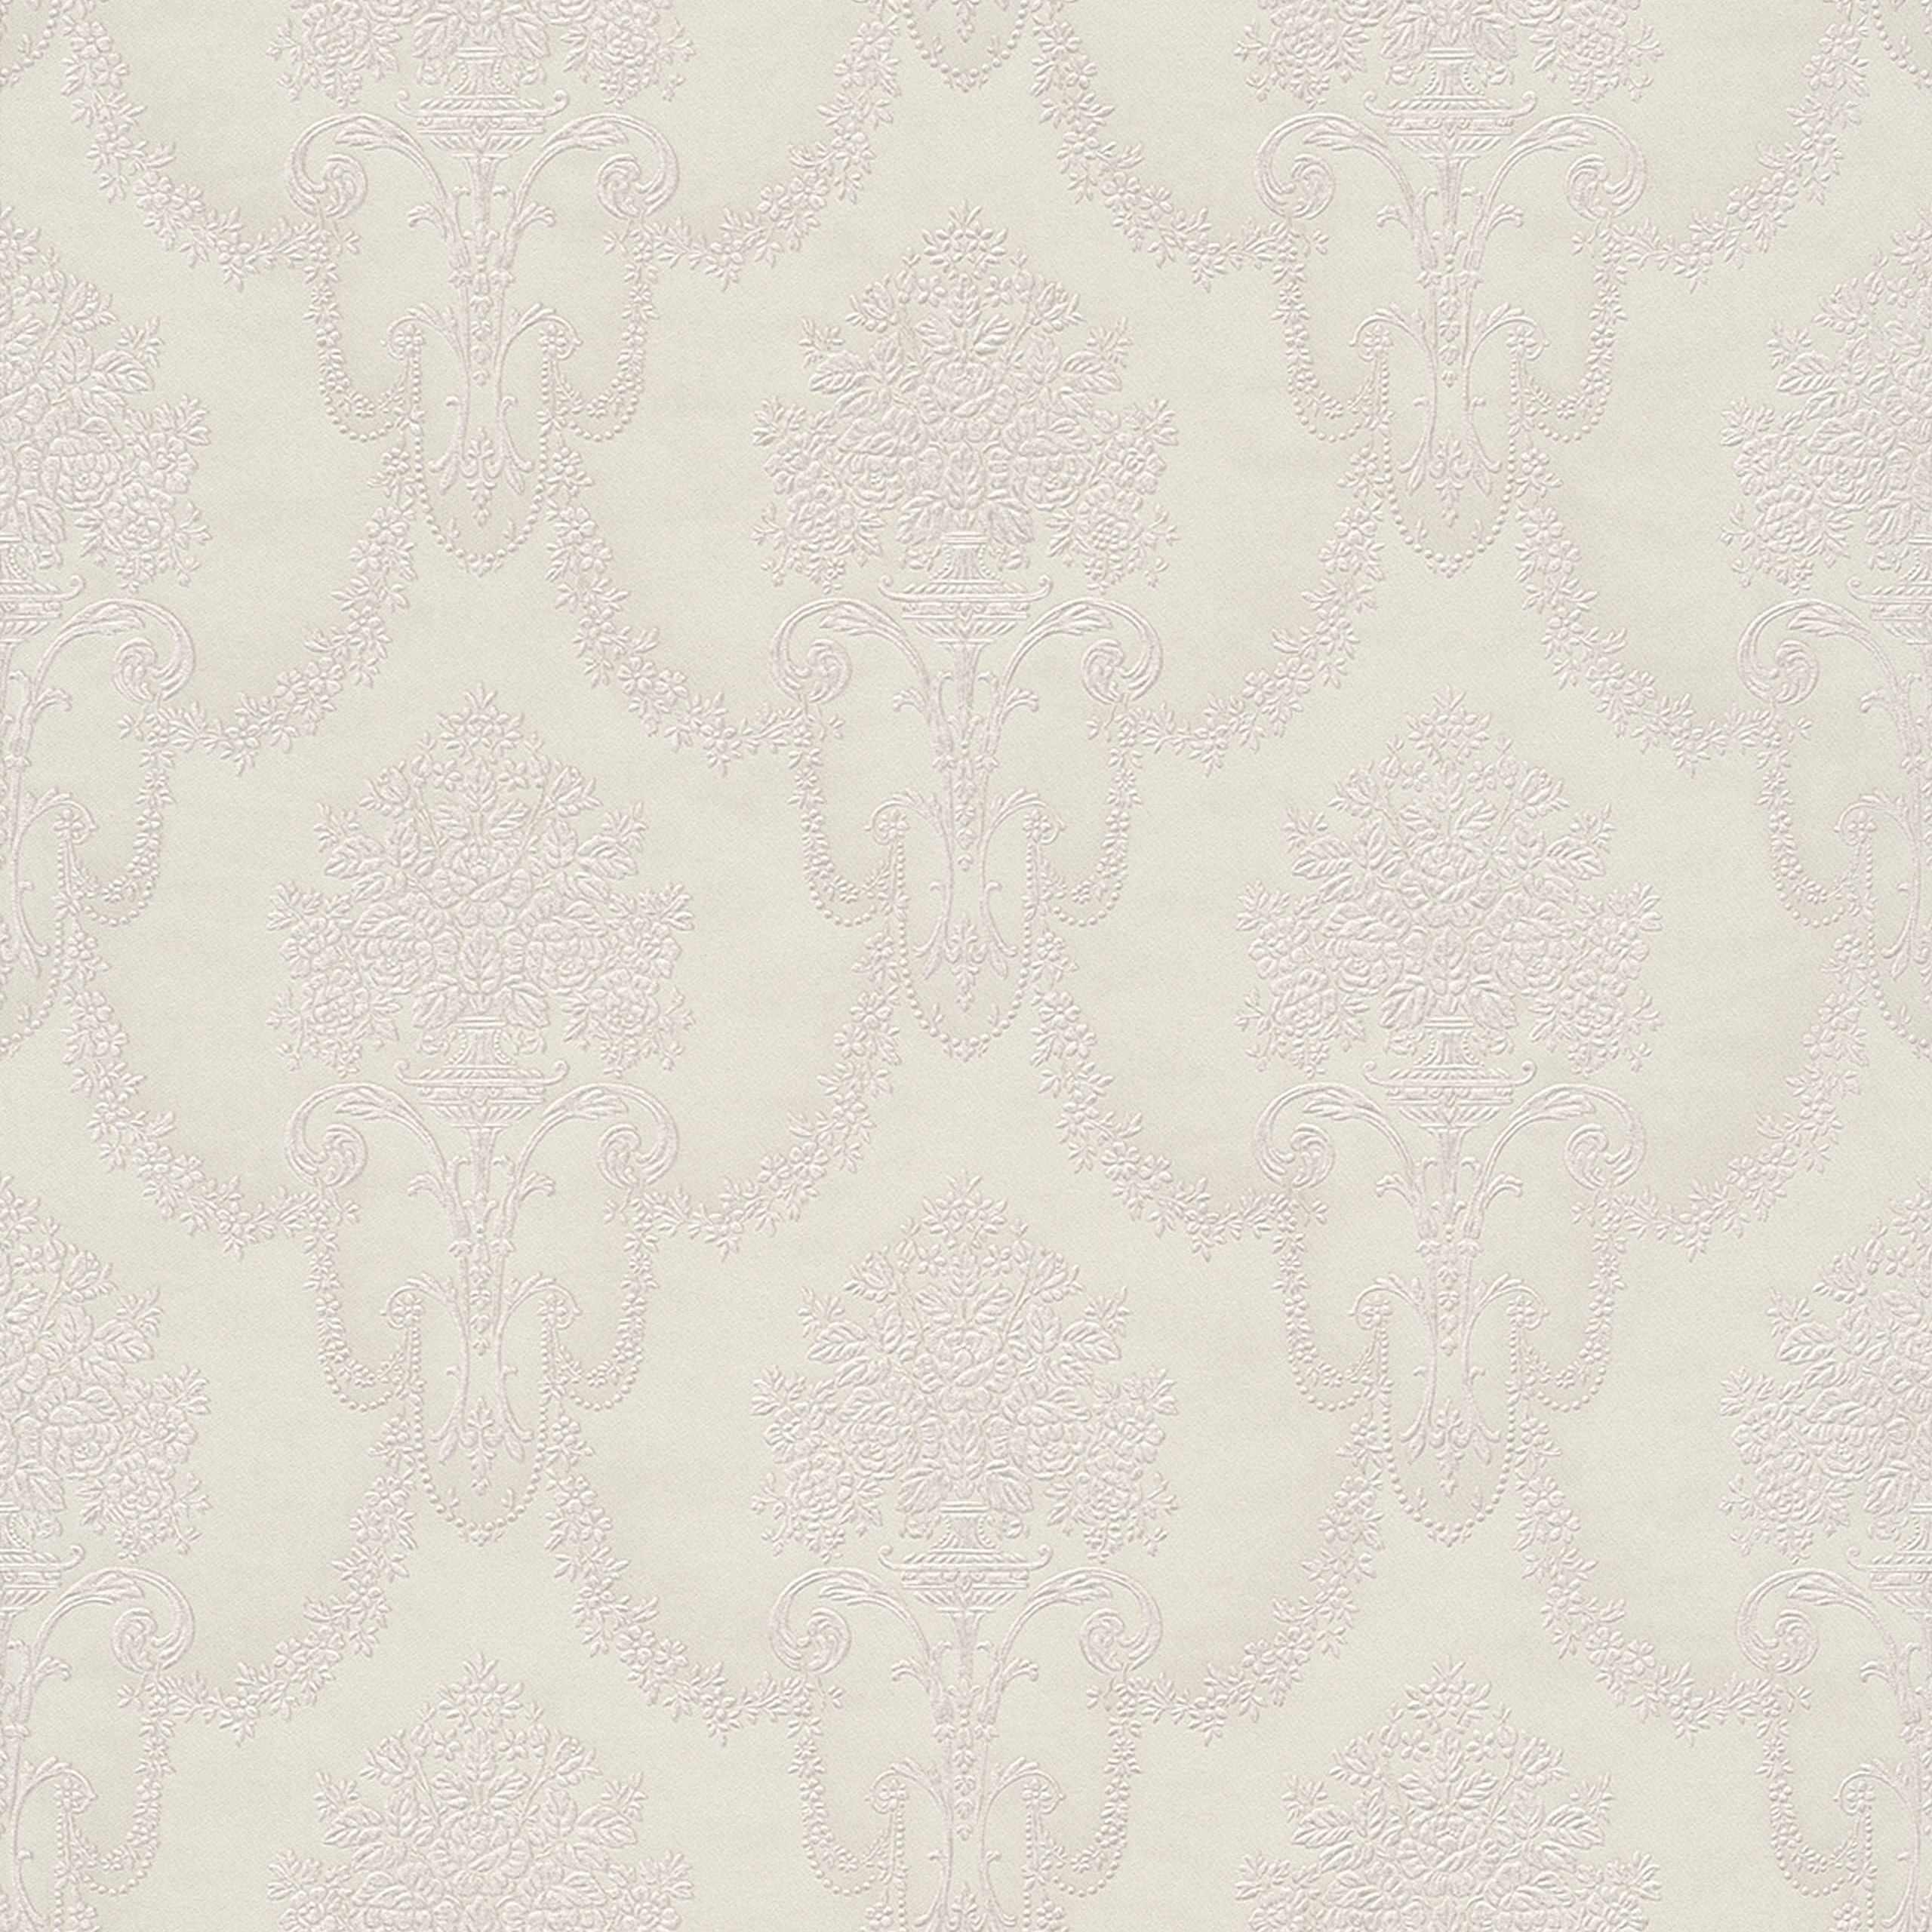 Rasch Vlies-Tapete Kollektion 'Trianon XI' 514926 Vintage Barock-Dekor